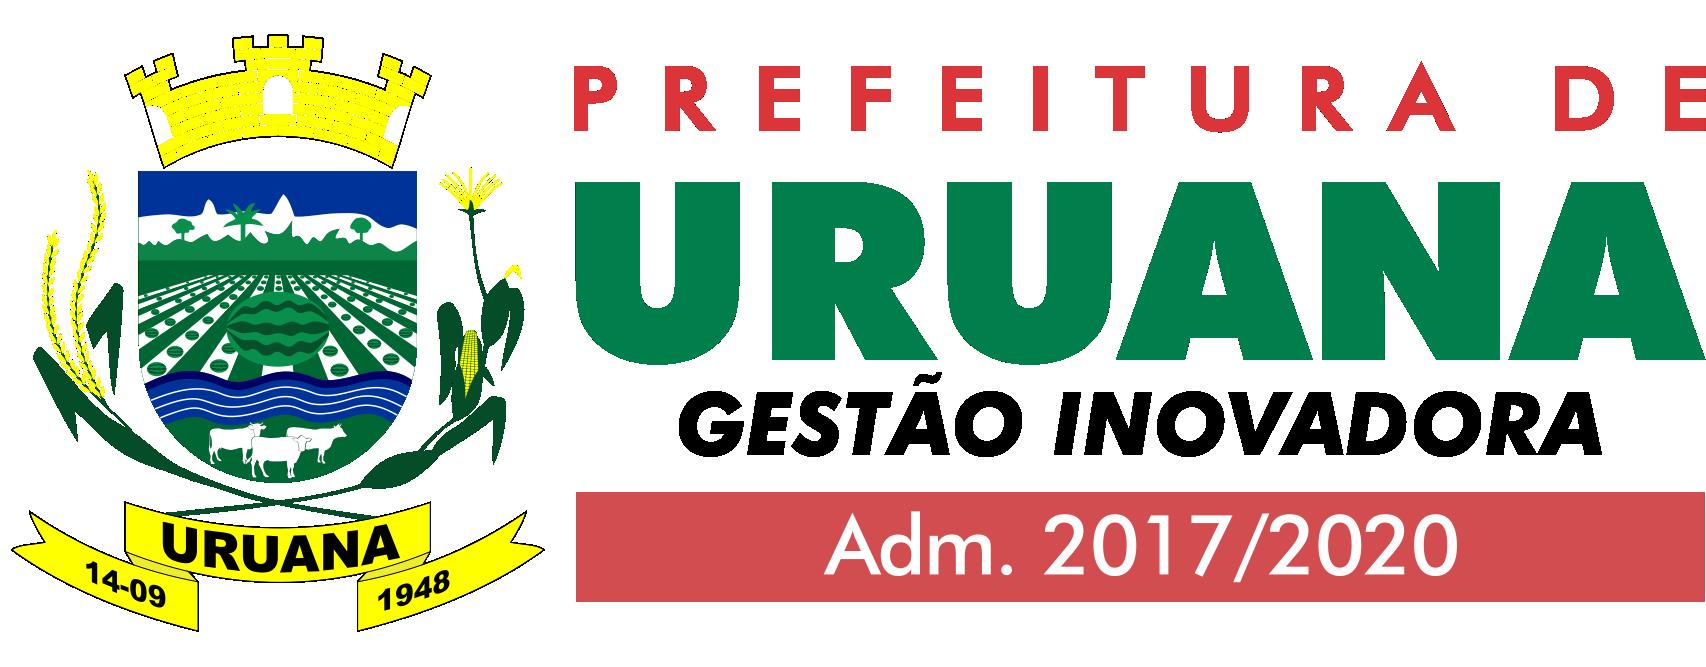 PREFEITURA MUNICIPAL DE URUANA